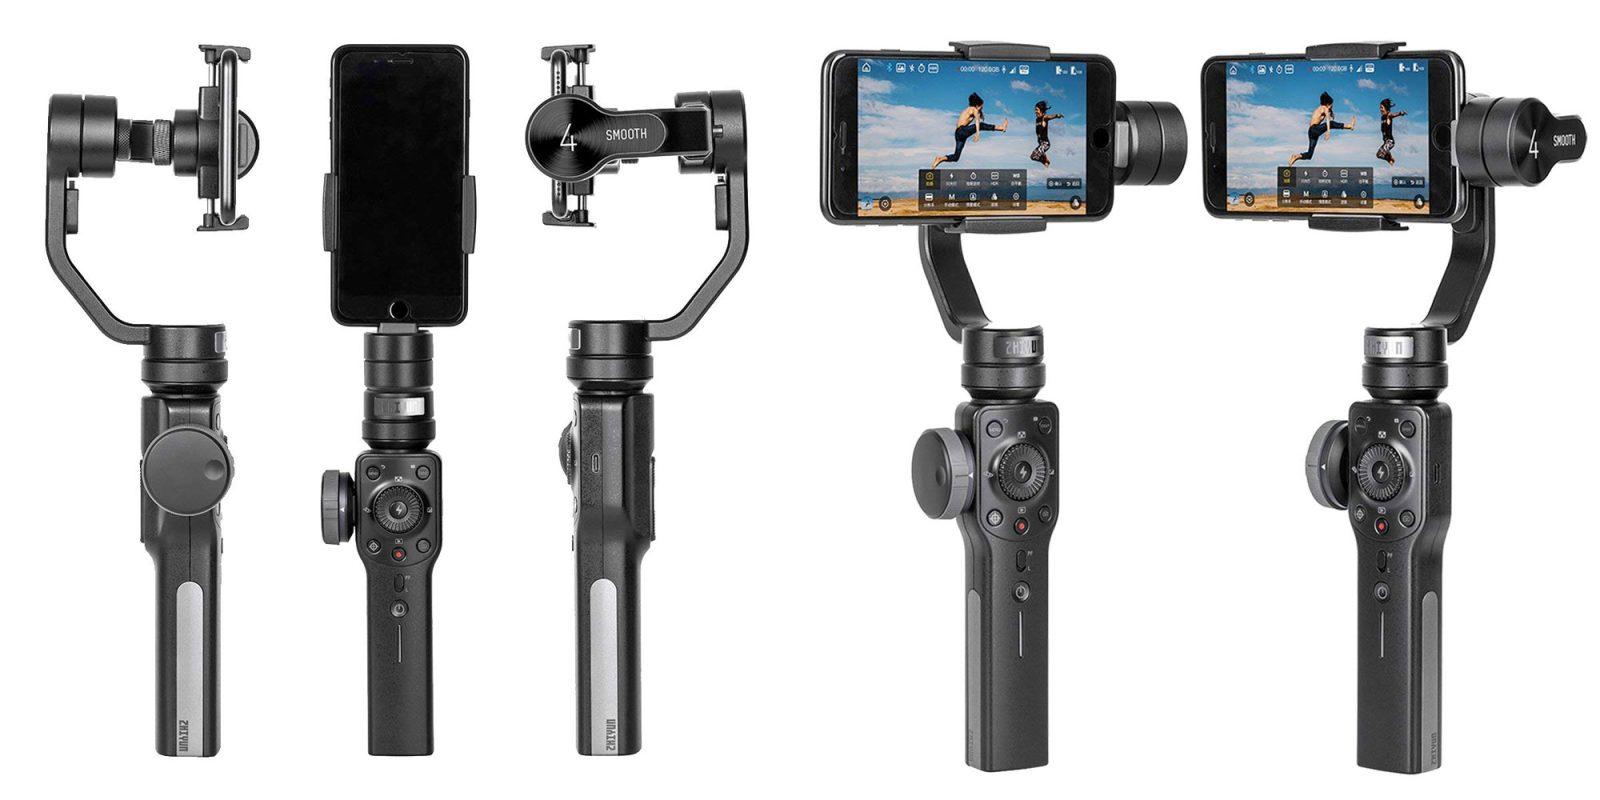 The Zhiyun Smooth 4 Smartphone Gimbal captures stunning video: $95 (Reg. $119)